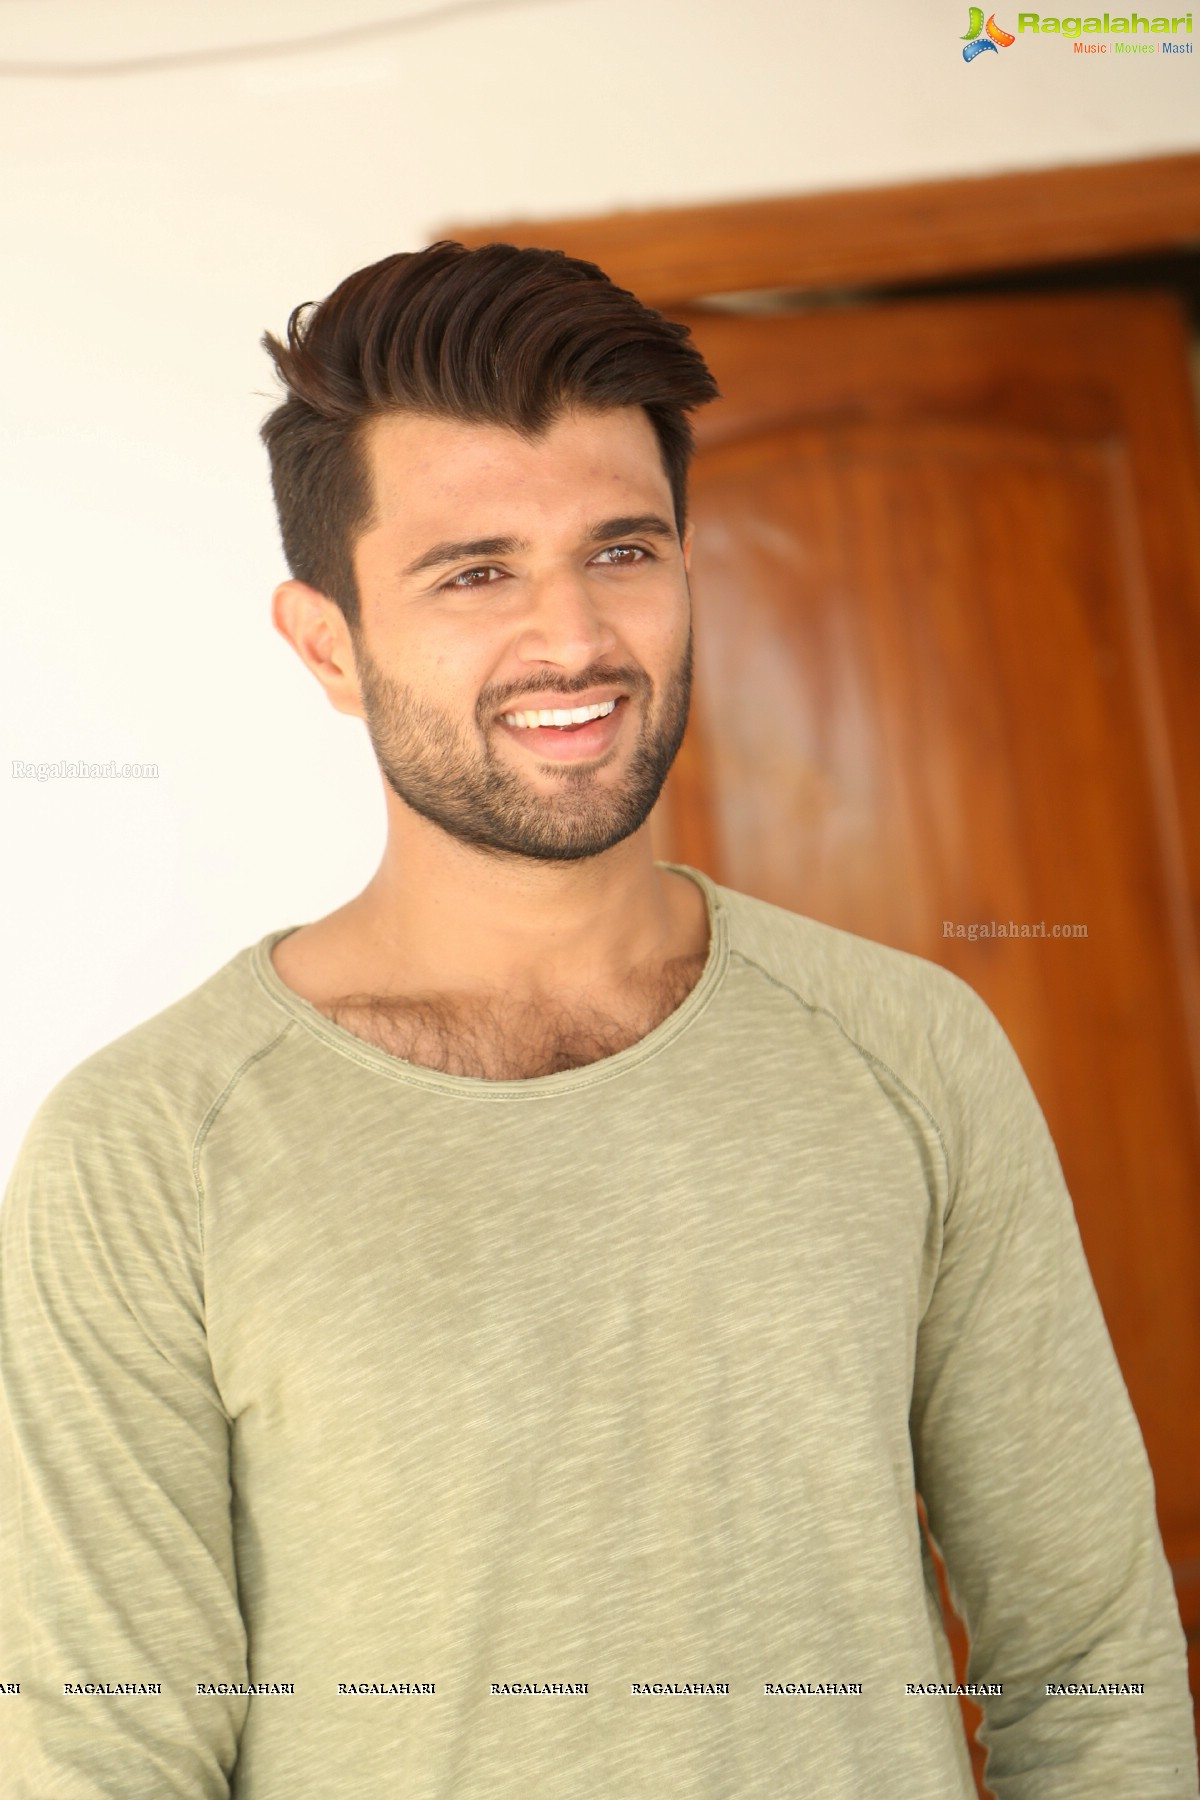 Vijay Devarakonda Image 39 Latest Bollywood Actor Wallpapers